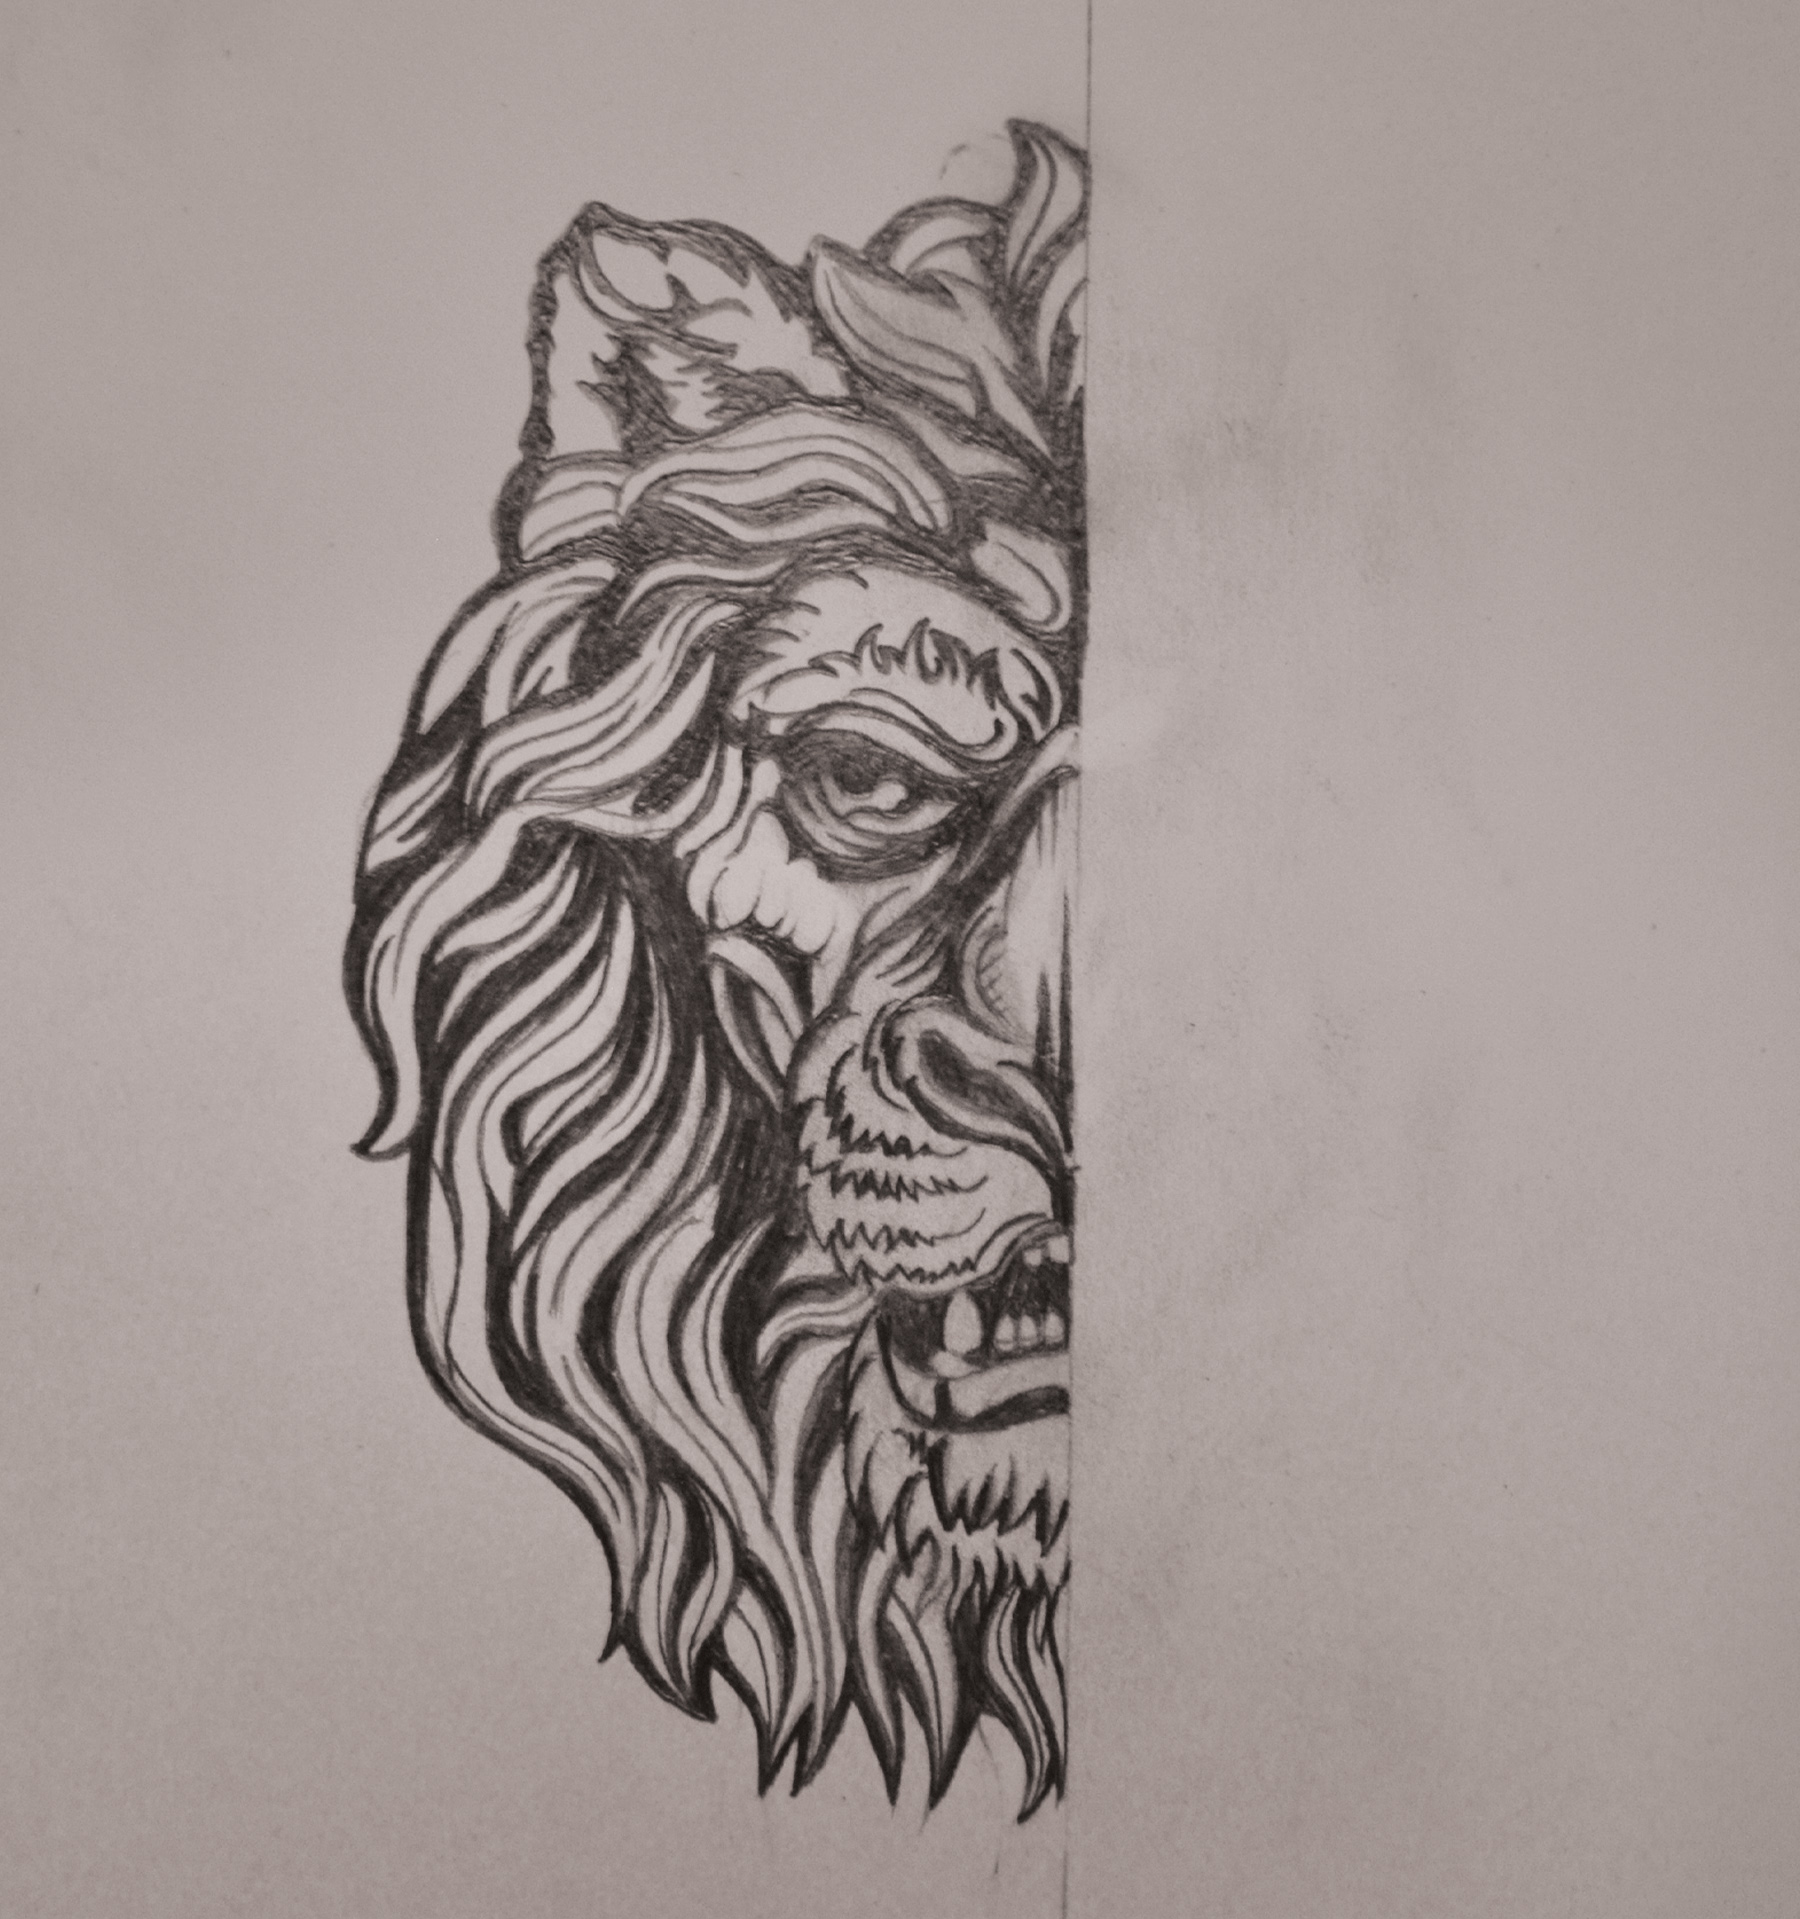 LION_illustration5.jpg